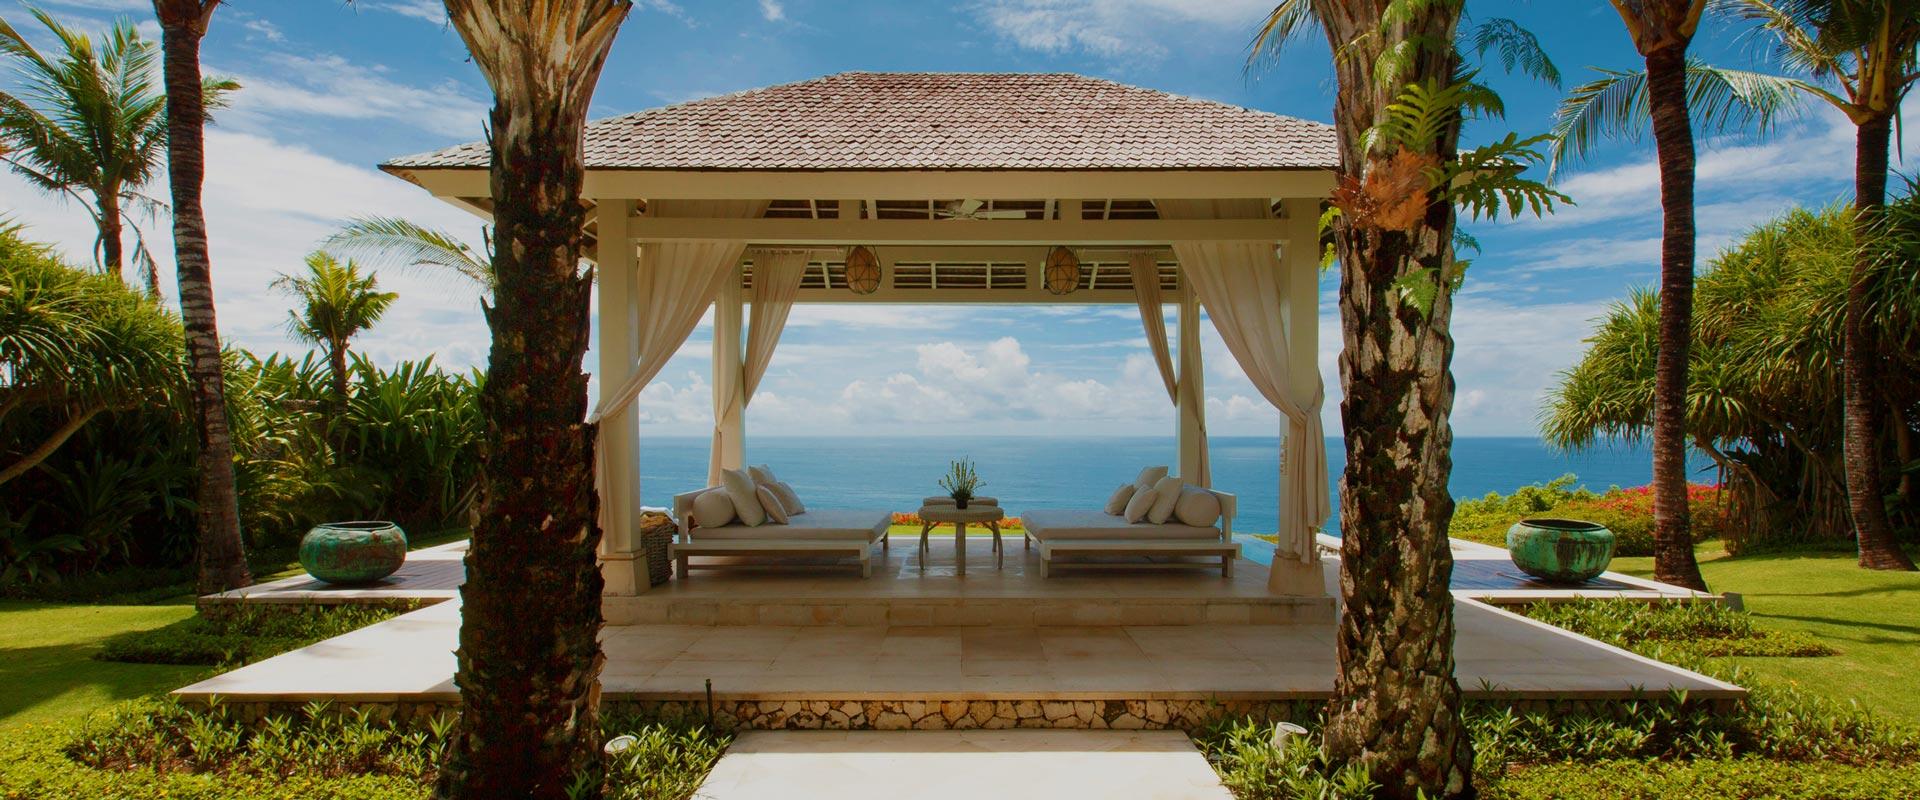 Luxury Bali Villas - Ultimate Bali